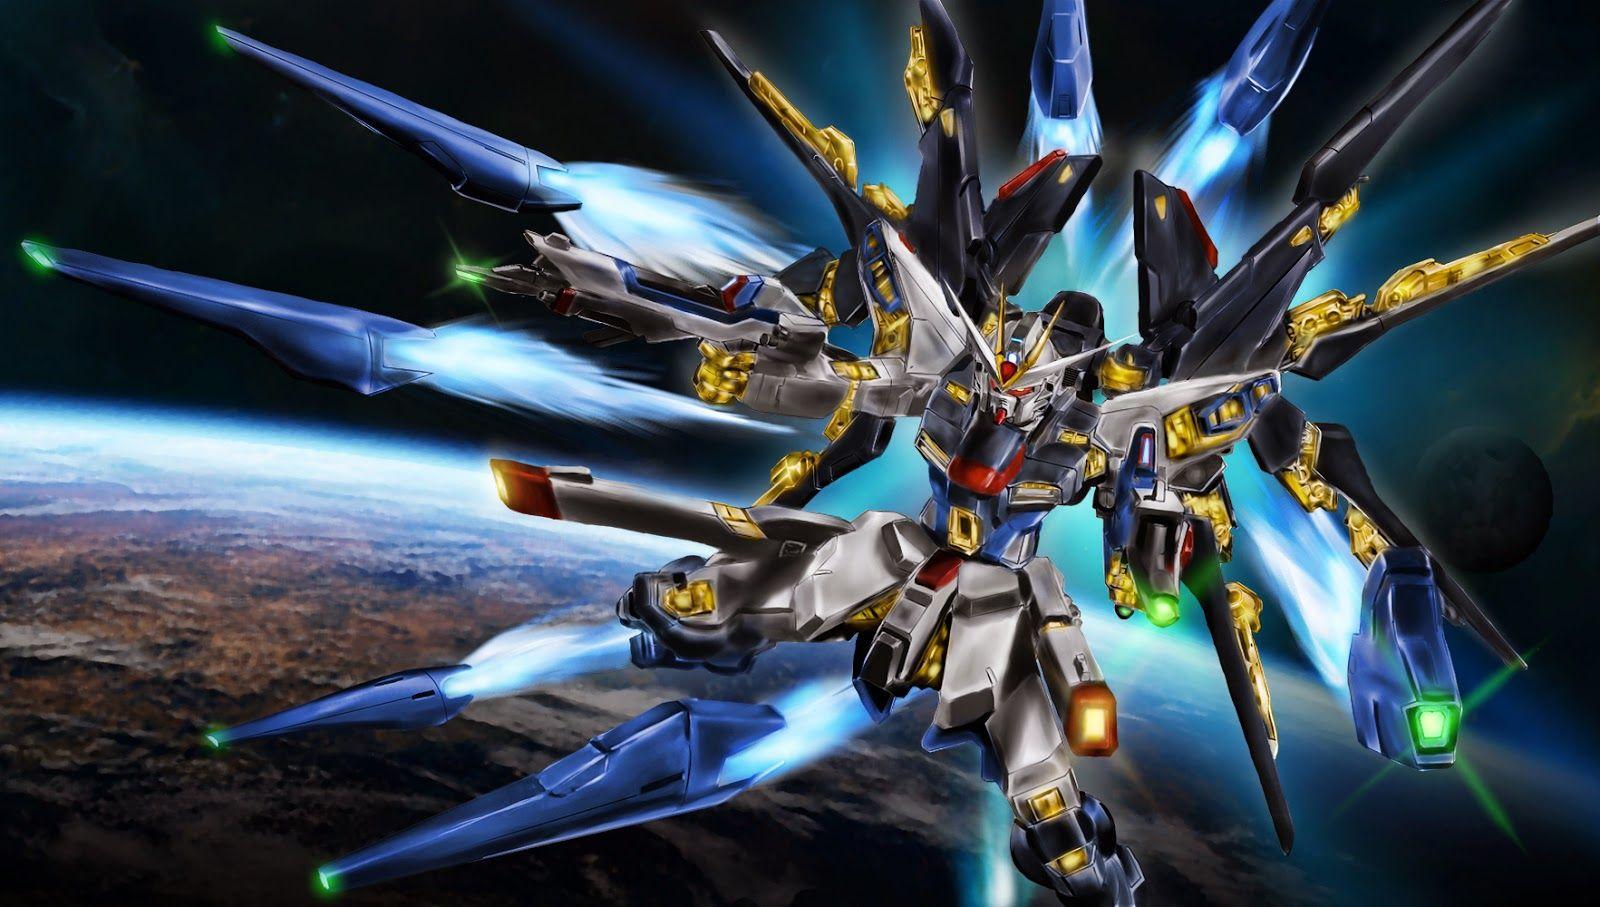 Awesome Gundam Digital Artworks Updated 8 7 16 ガンダムseed